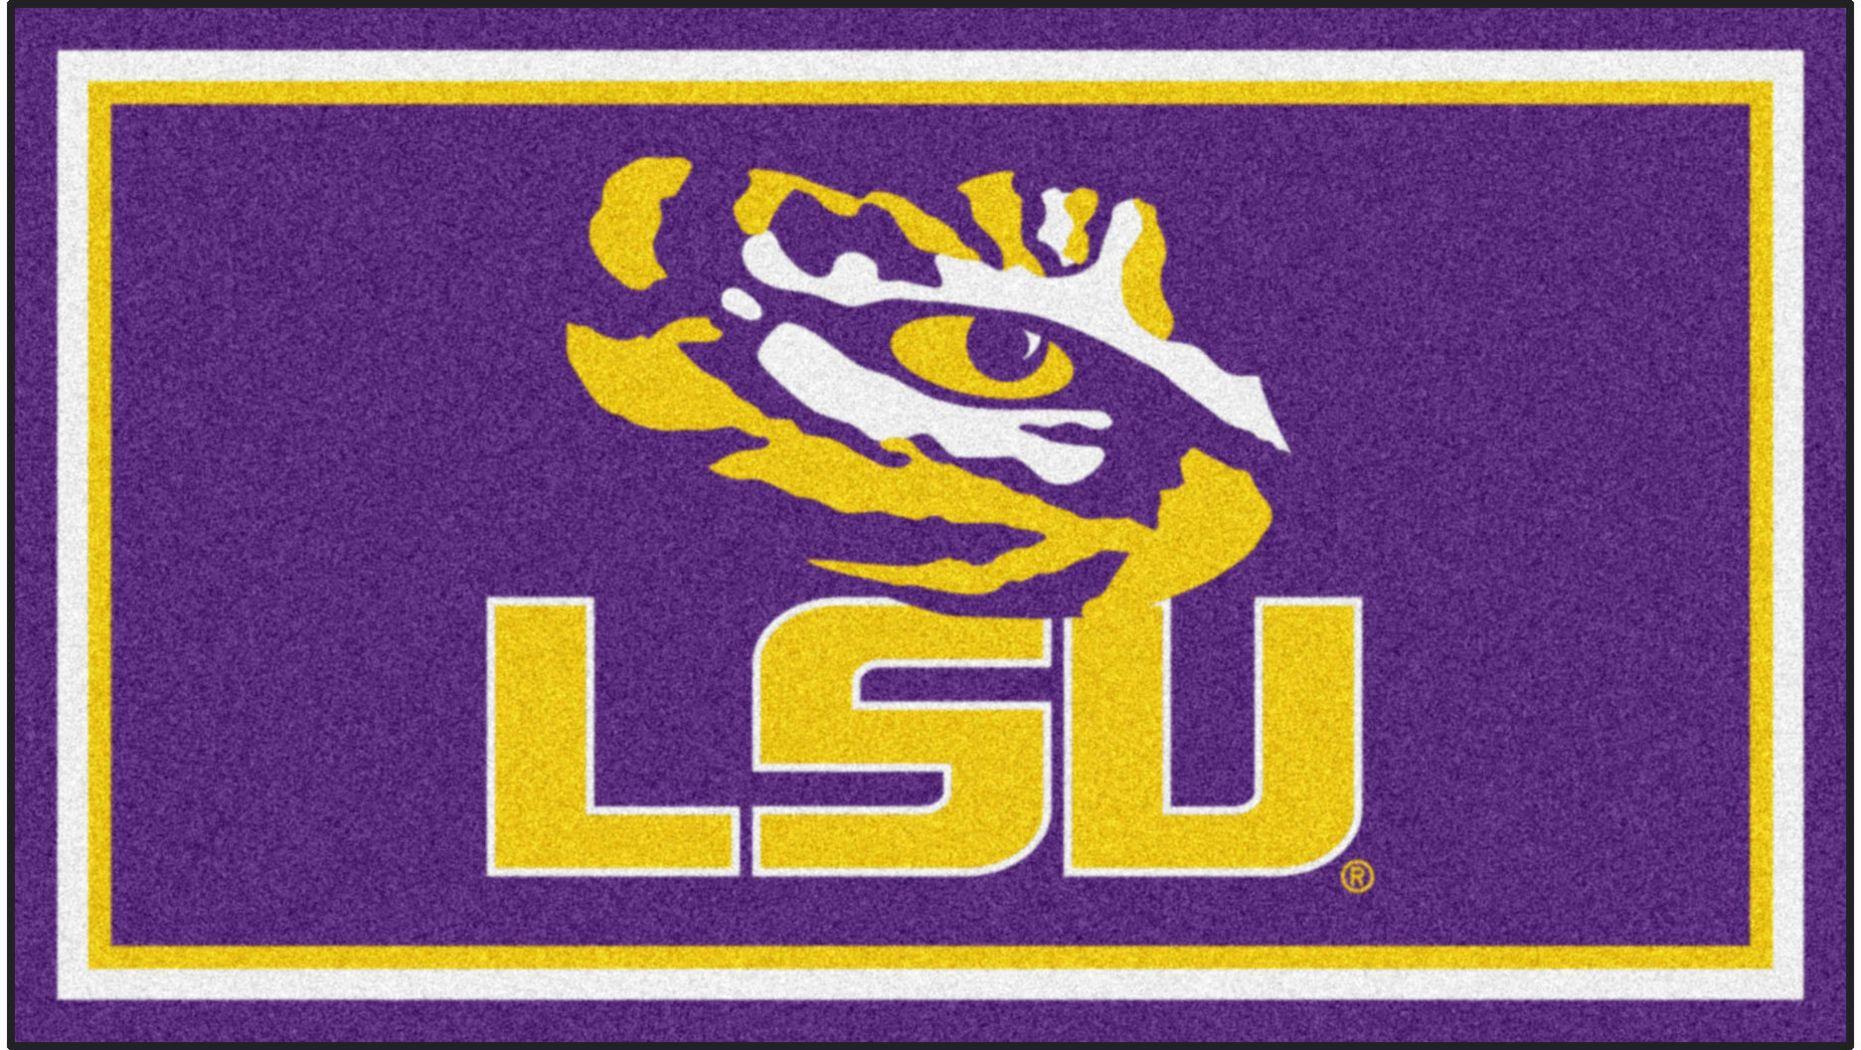 NCAA Big Game Louisiana State University 3' x 5' Rug